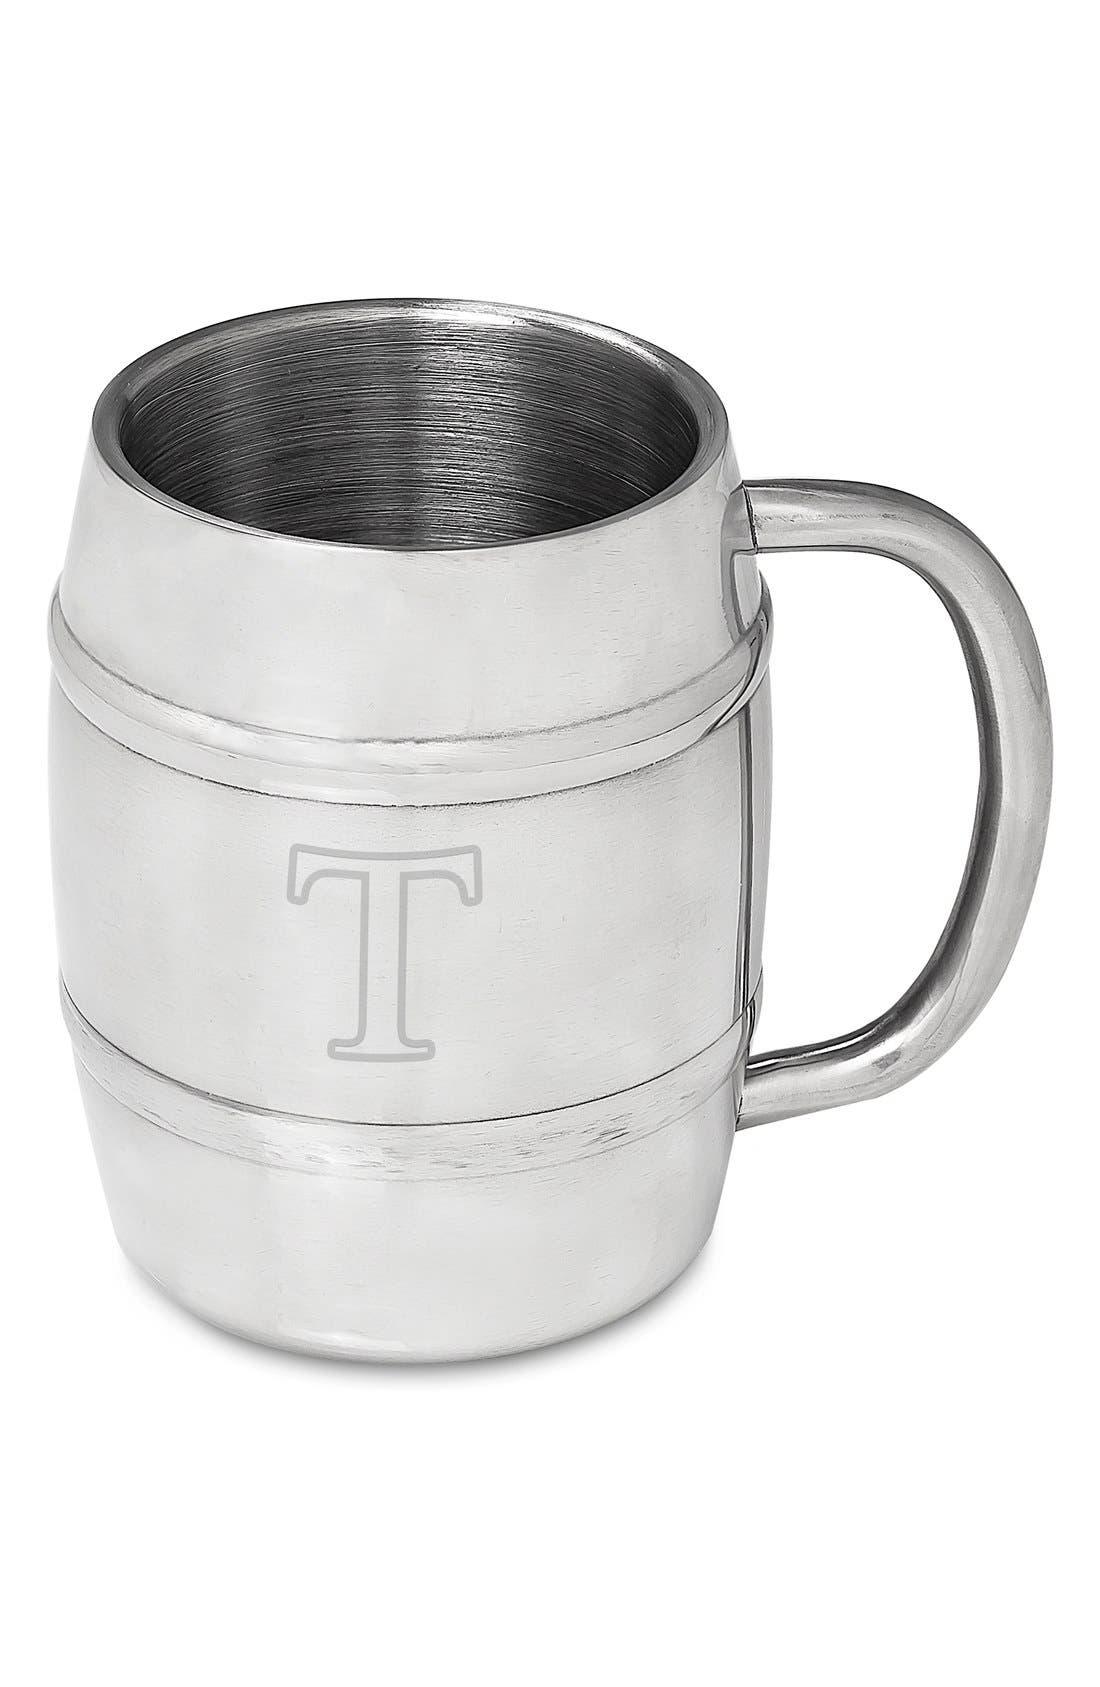 Monogram Stainless Steel Keg Mug,                         Main,                         color, 040